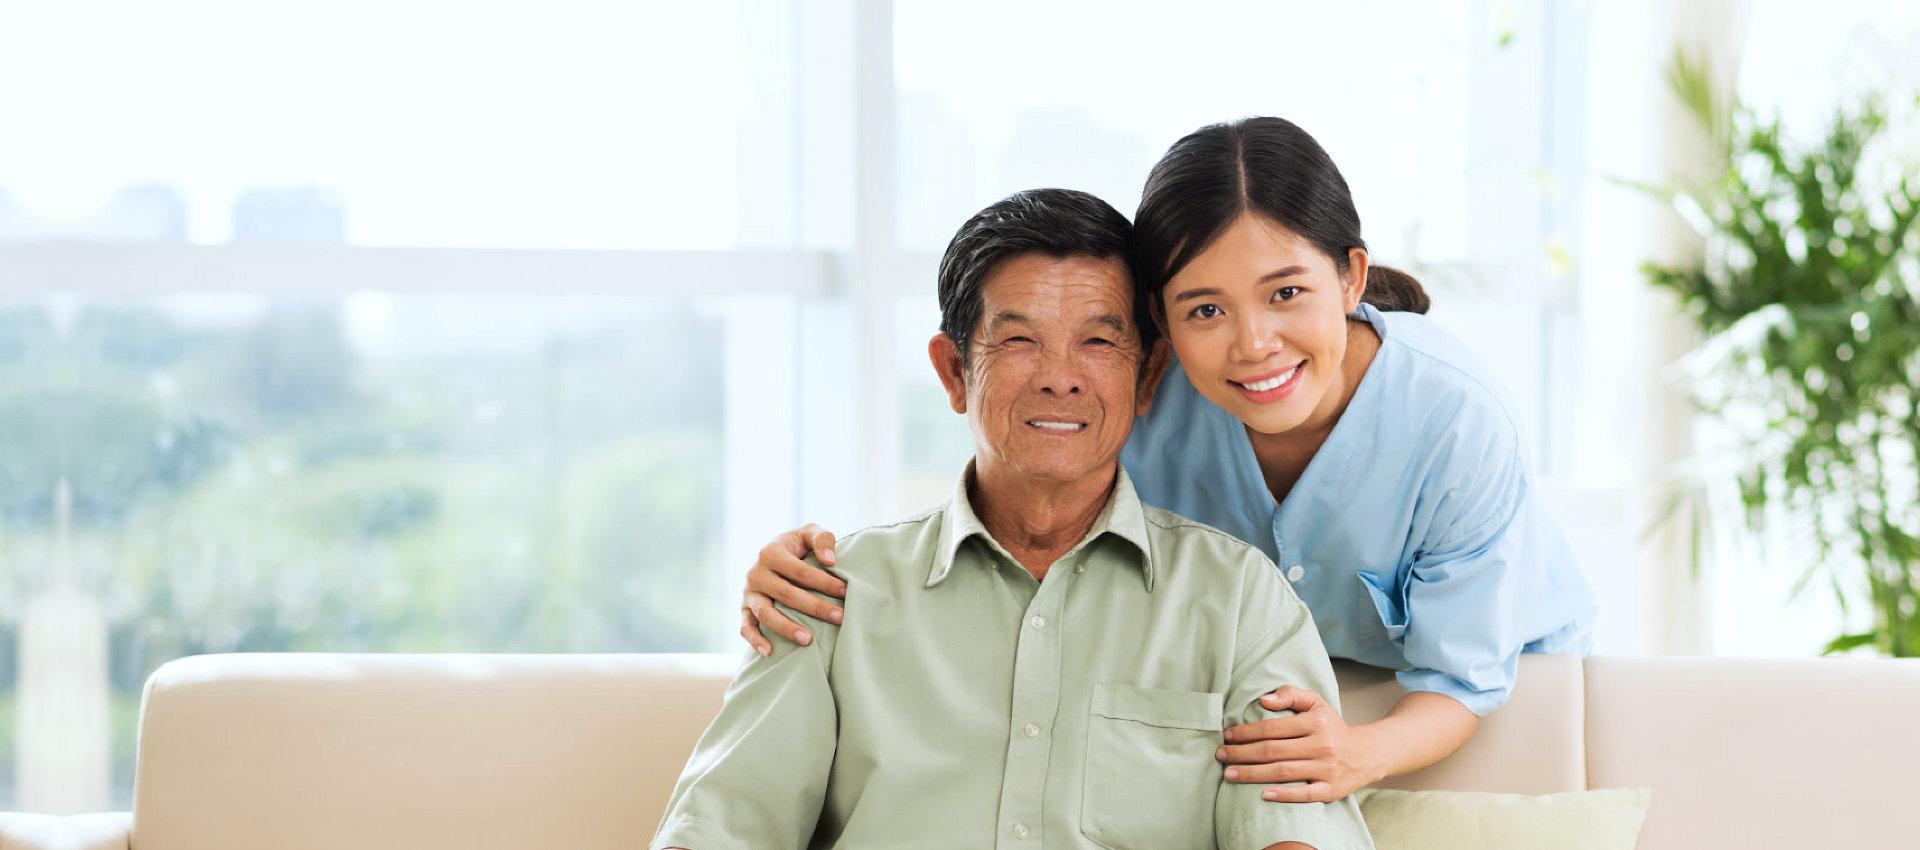 an elderly man and a caregiver woman